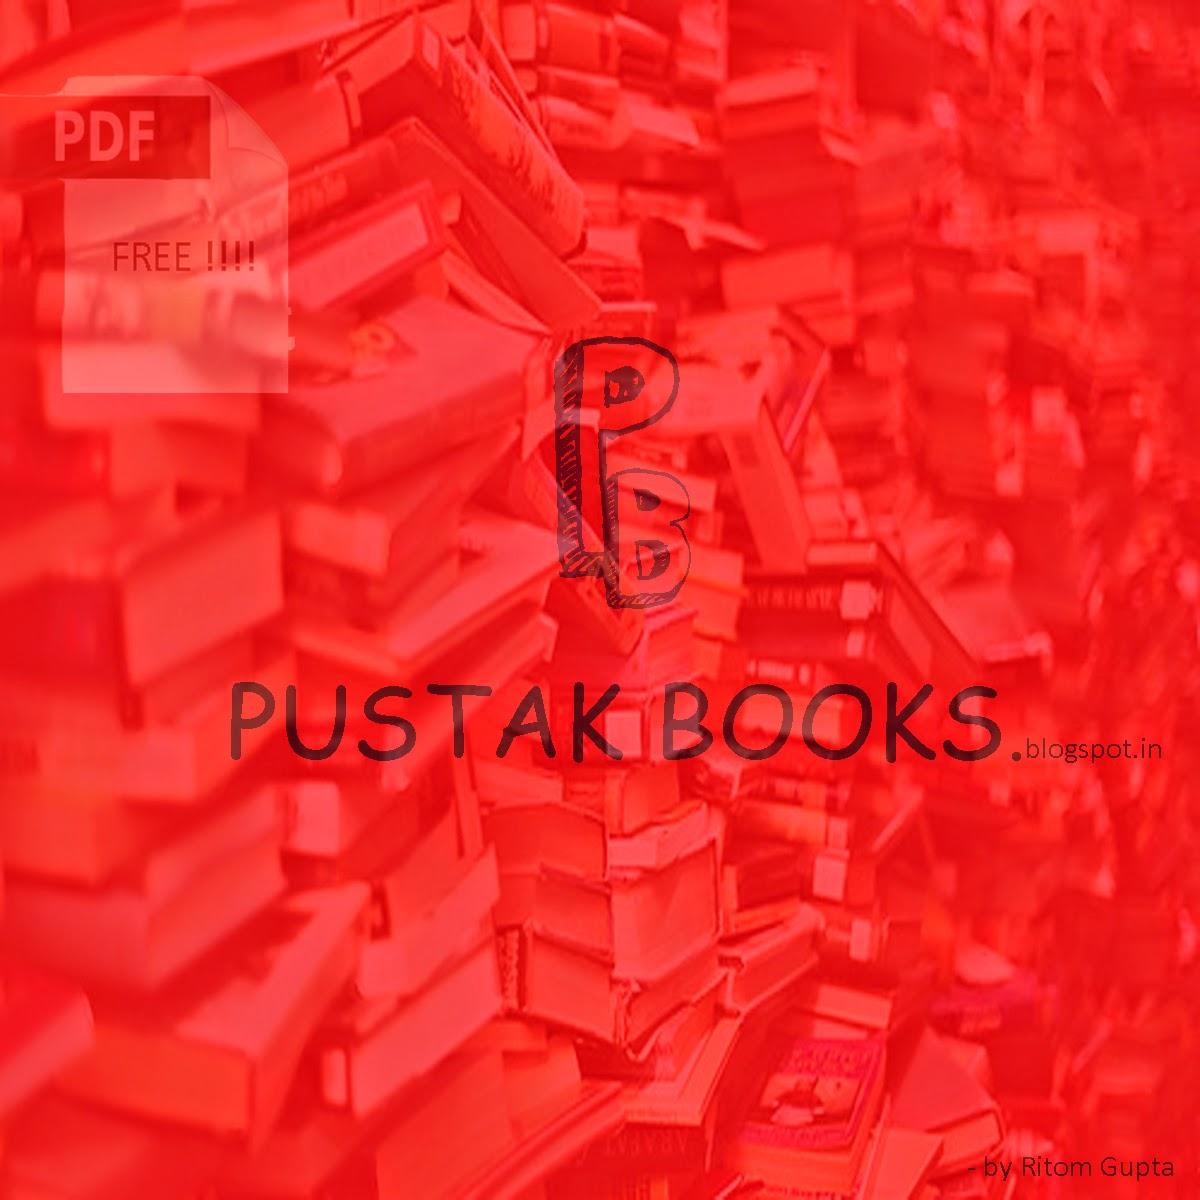 Pustak Books